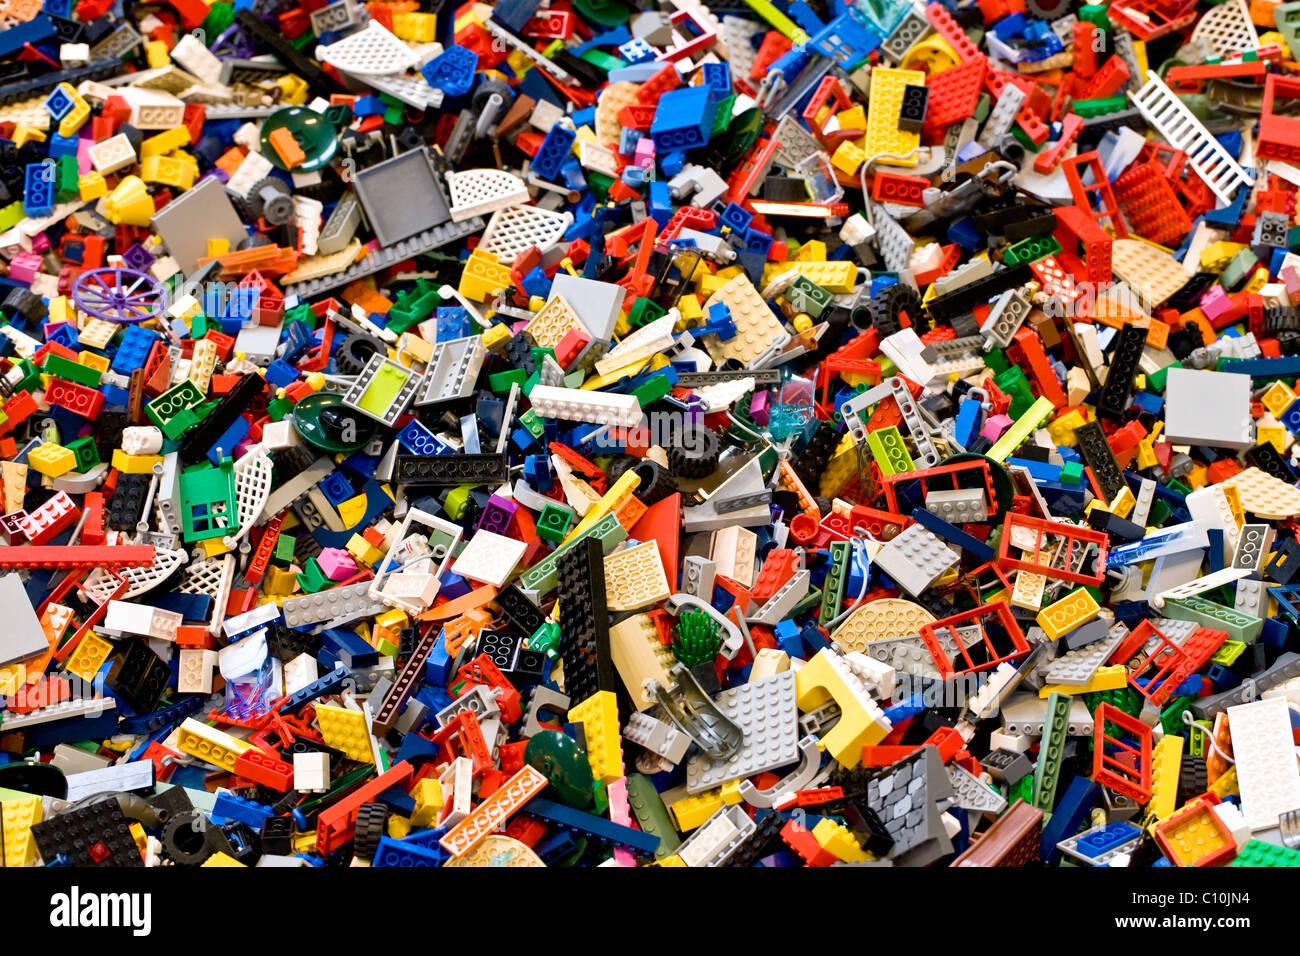 Heap of Lego bricks - Stock Image